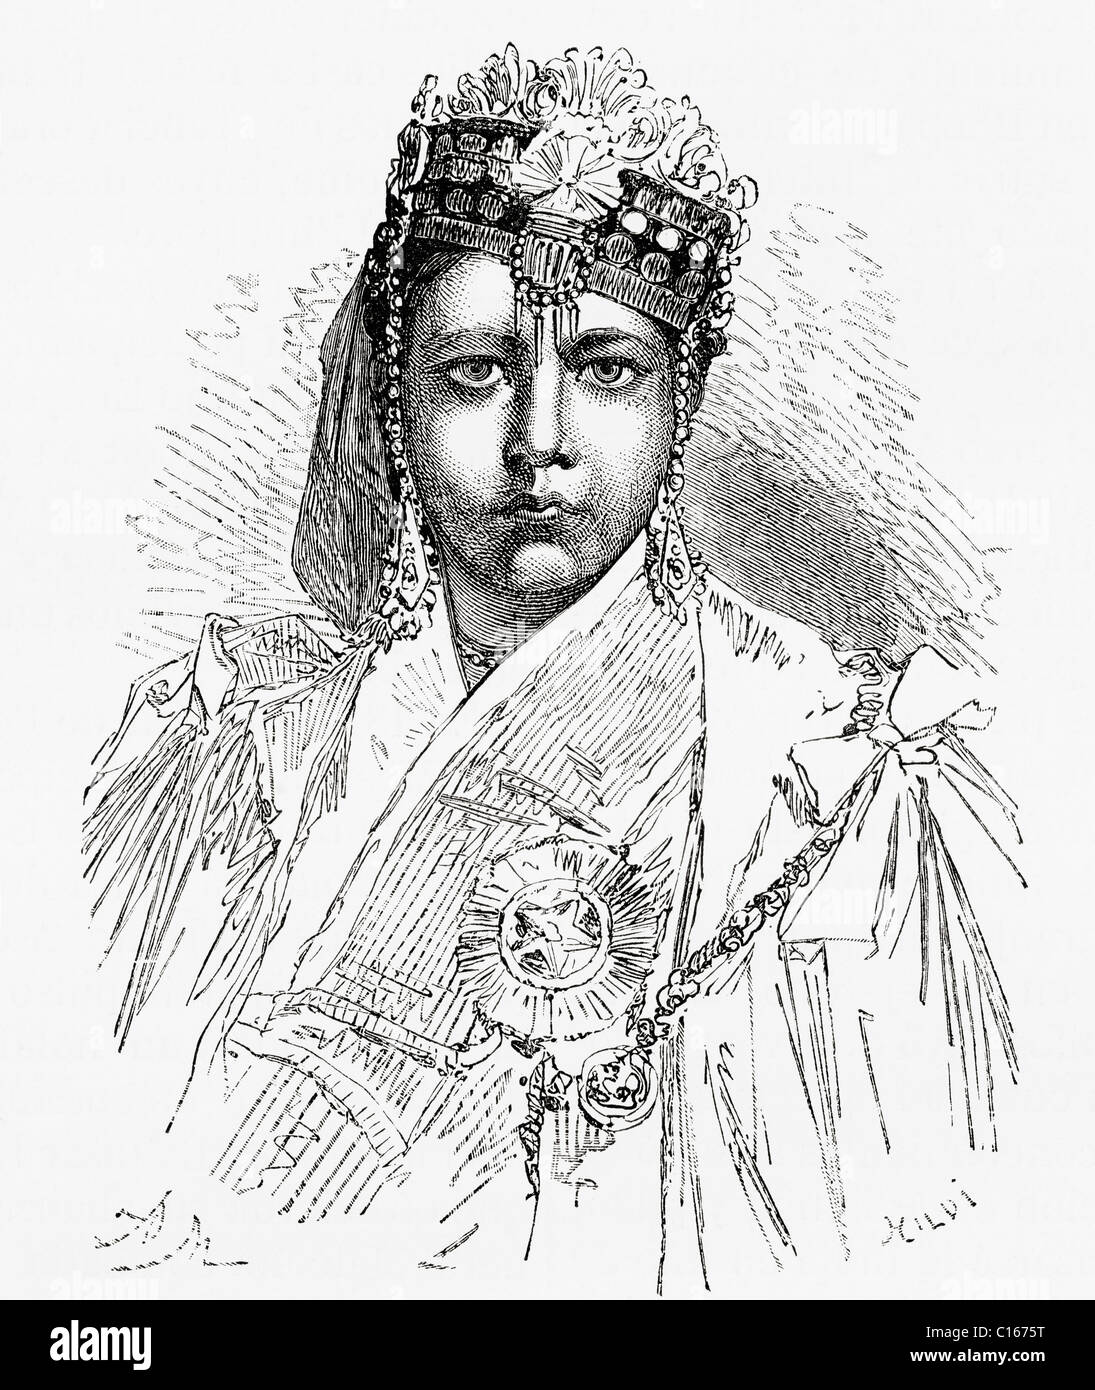 Nawwab Sultan Shah Jahan Begum Sahiba, 1838-1901. Begum of Bhopal, India. - Stock Image